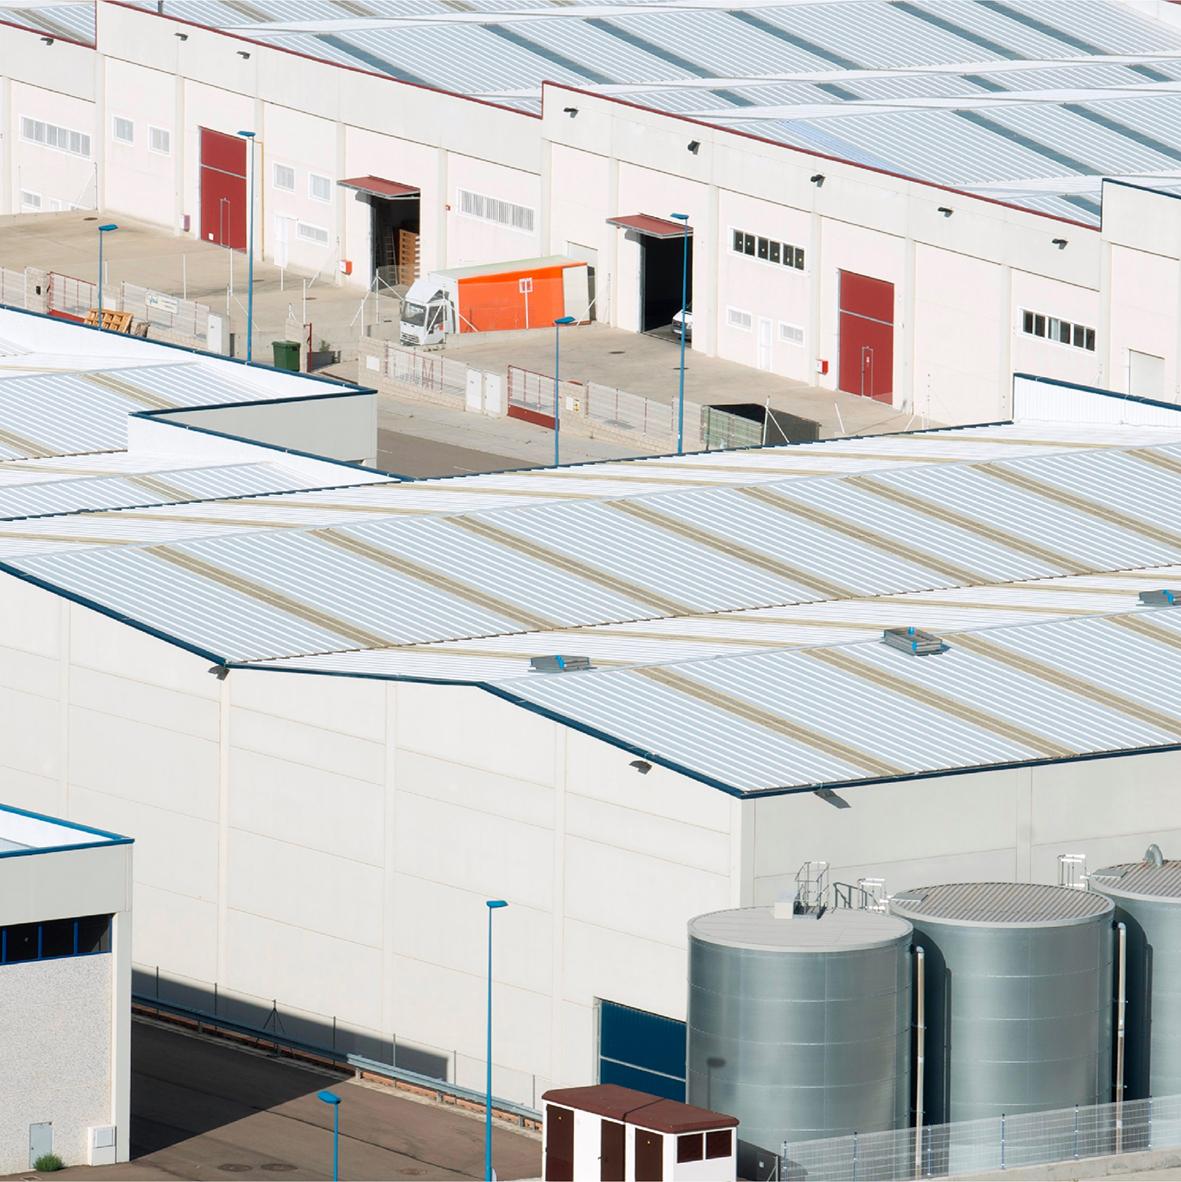 Auditorías energéticas obligatorias para 3800 empresas_2016